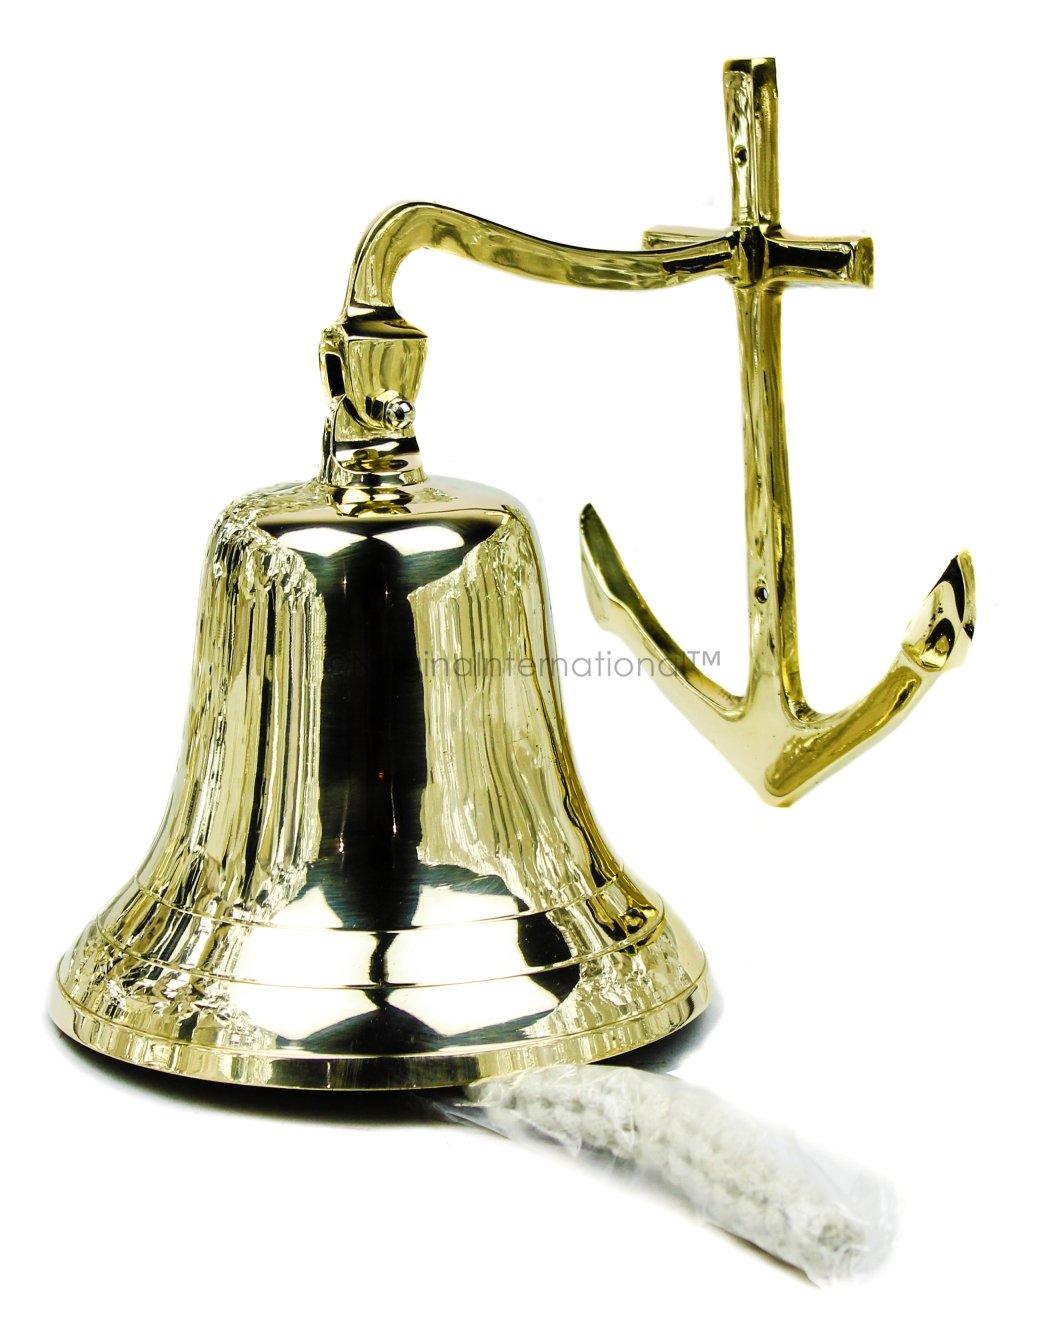 Nagina International 11'' Large Nautical Premium Ringing Brass Bell with Polished Shiny Finish | Beautiful Pirate Themed Decor | Christmas Special